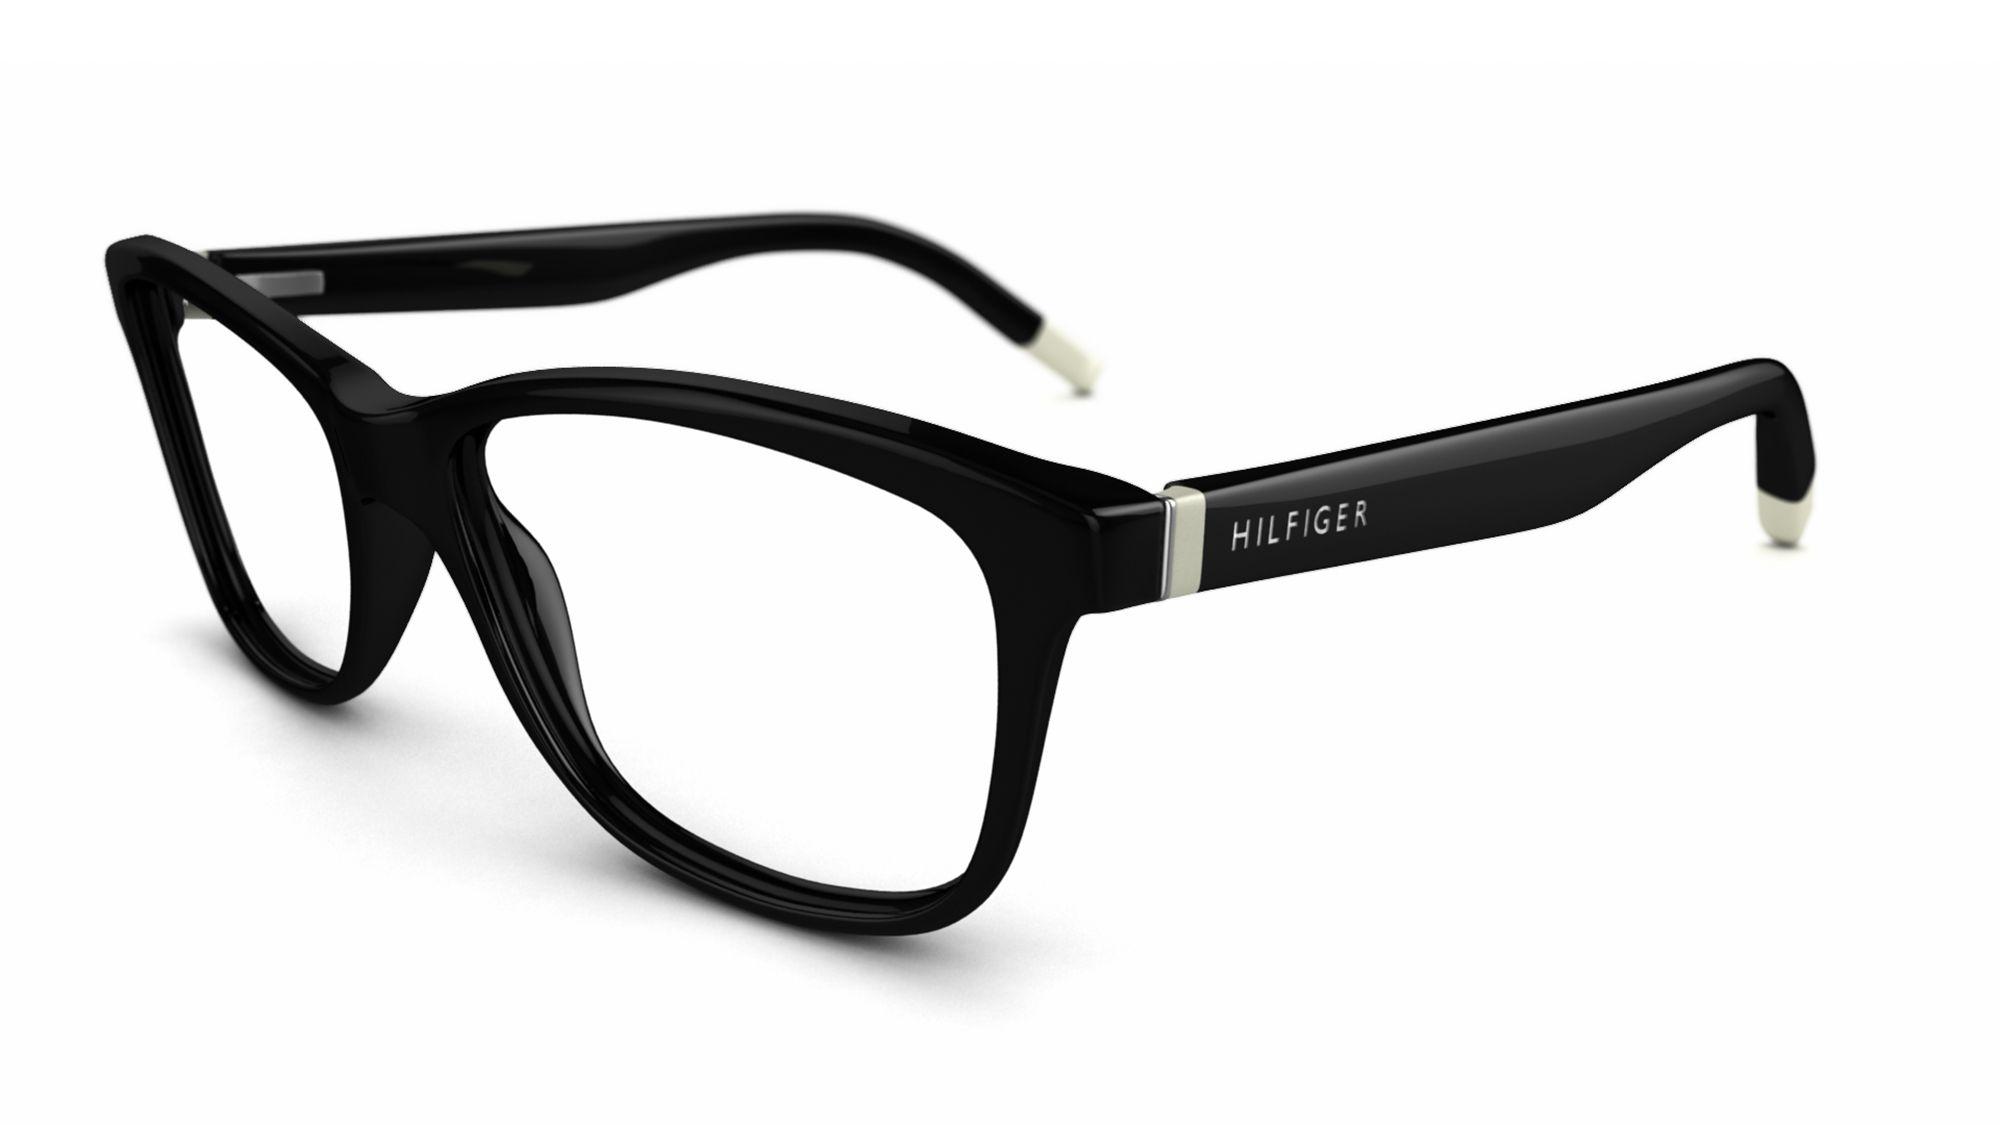 Tommy Hilfiger glasses - TH 66